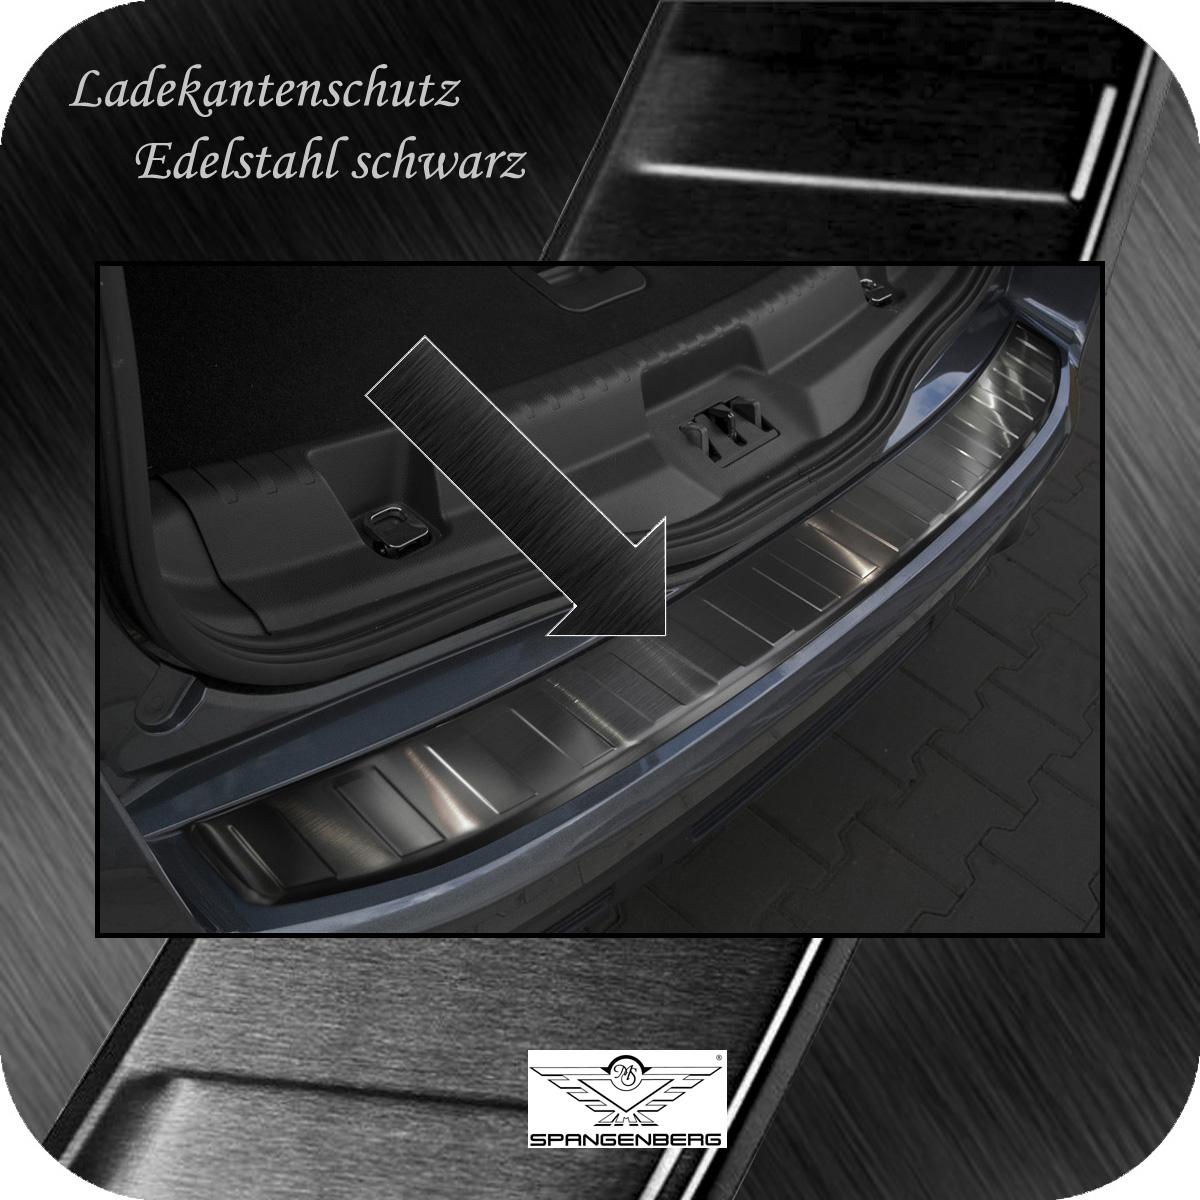 Ladekantenschutz Edelstahl schwarz graphit Ford S-MAX II Kombi ab 2015- 3245032